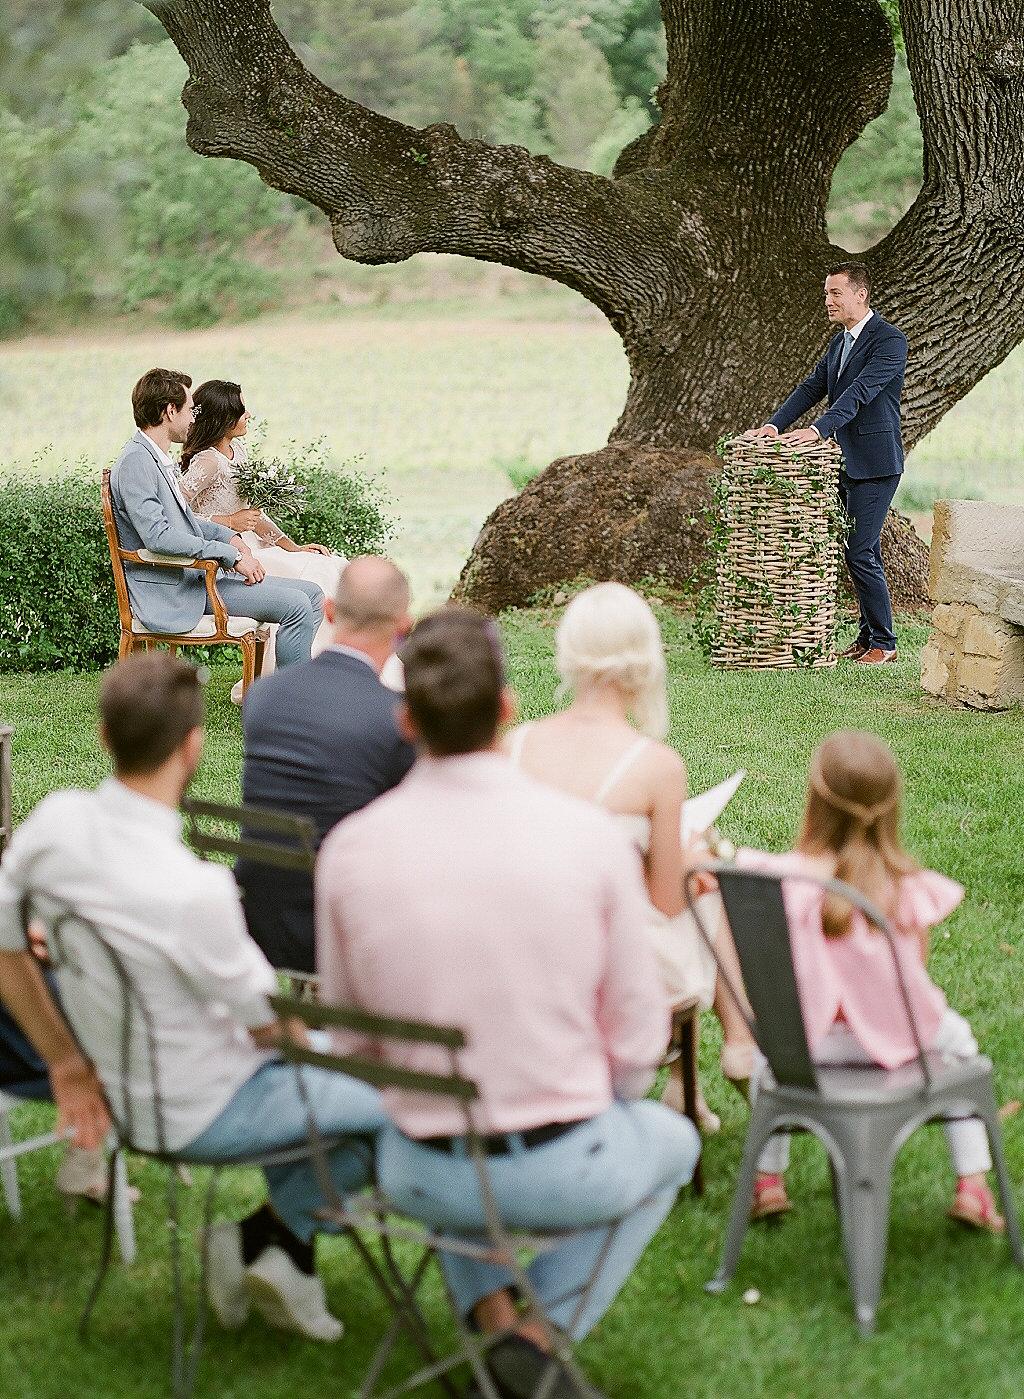 le coeur dans les etoiles - wedding planner - provence - luberon - alpilles - drome - vaucluse - sardaigne - italie - organisation - mariage - shooting - dolce vita - valery villard-276